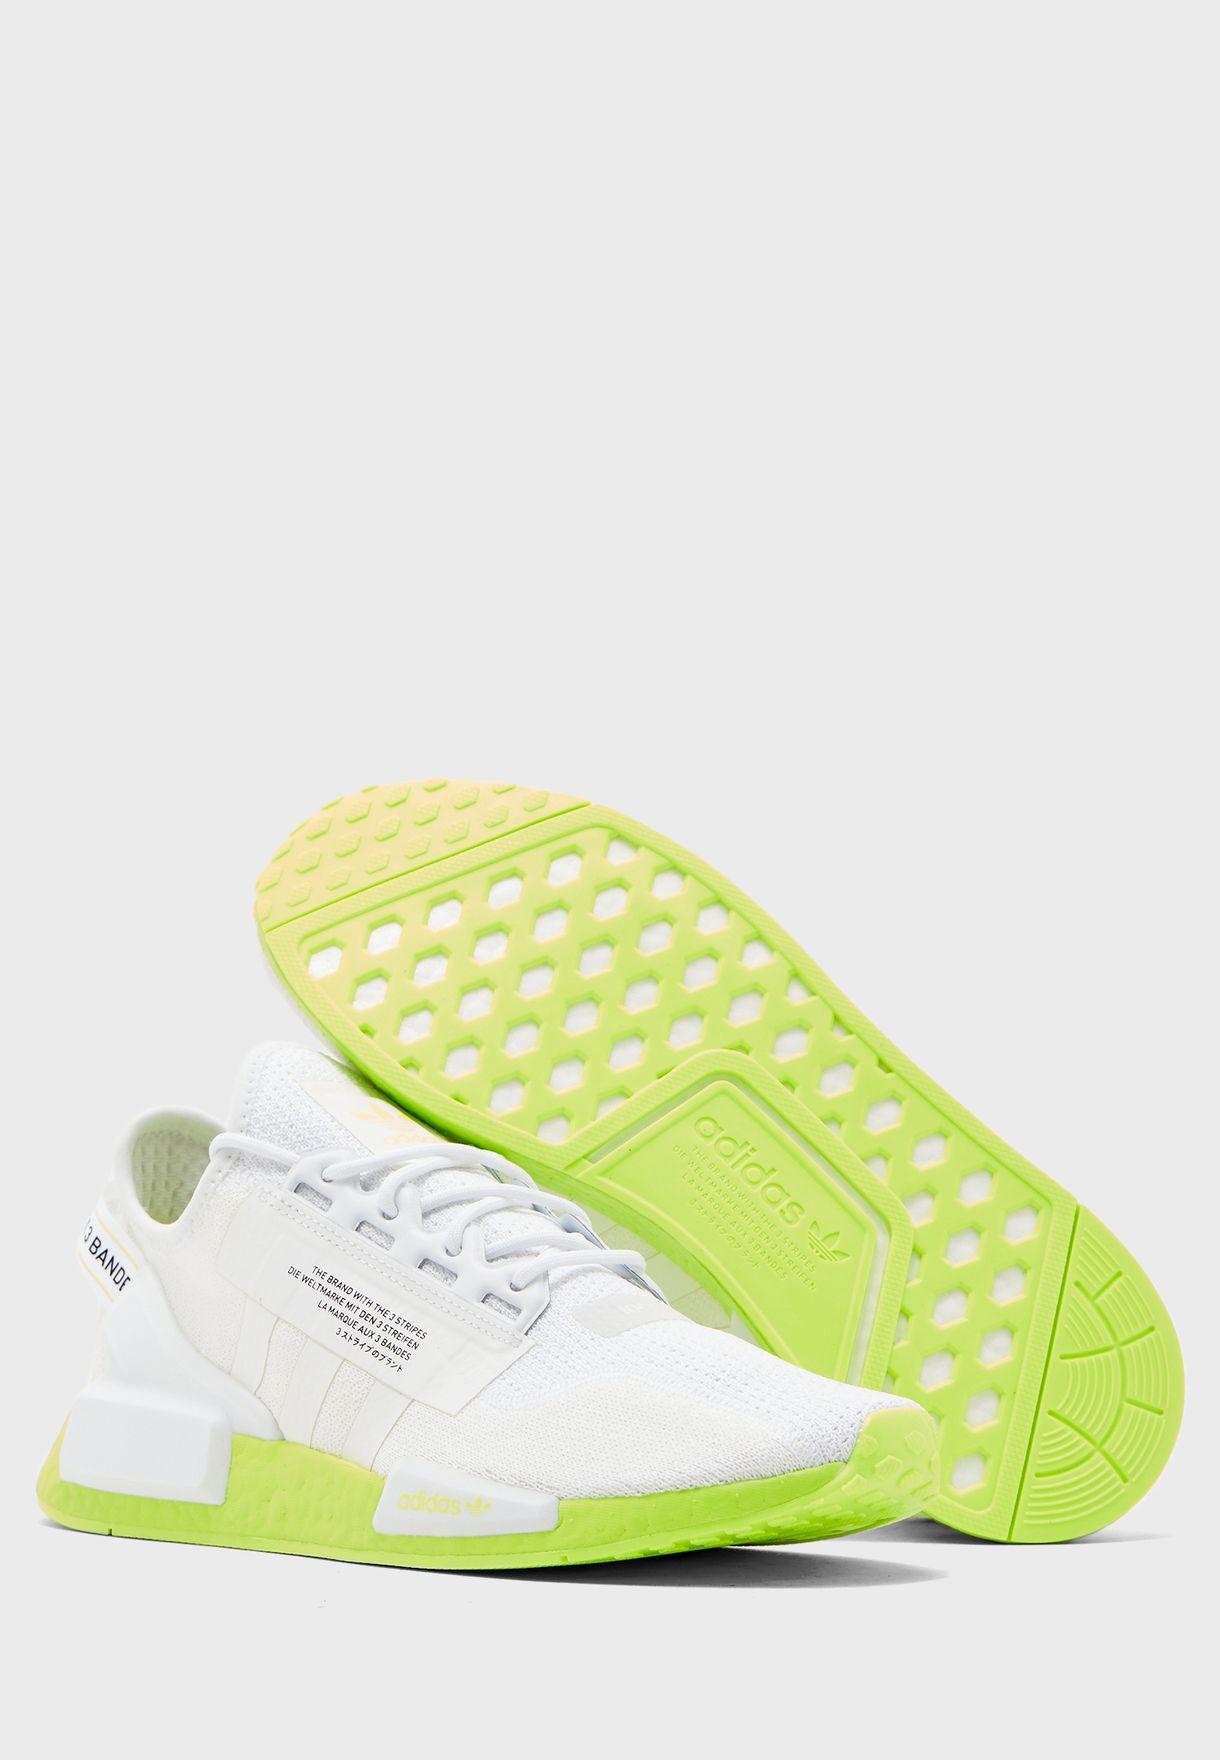 Buy Adidas Originals White Nmd R1 V2 For Men In Mena Worldwide